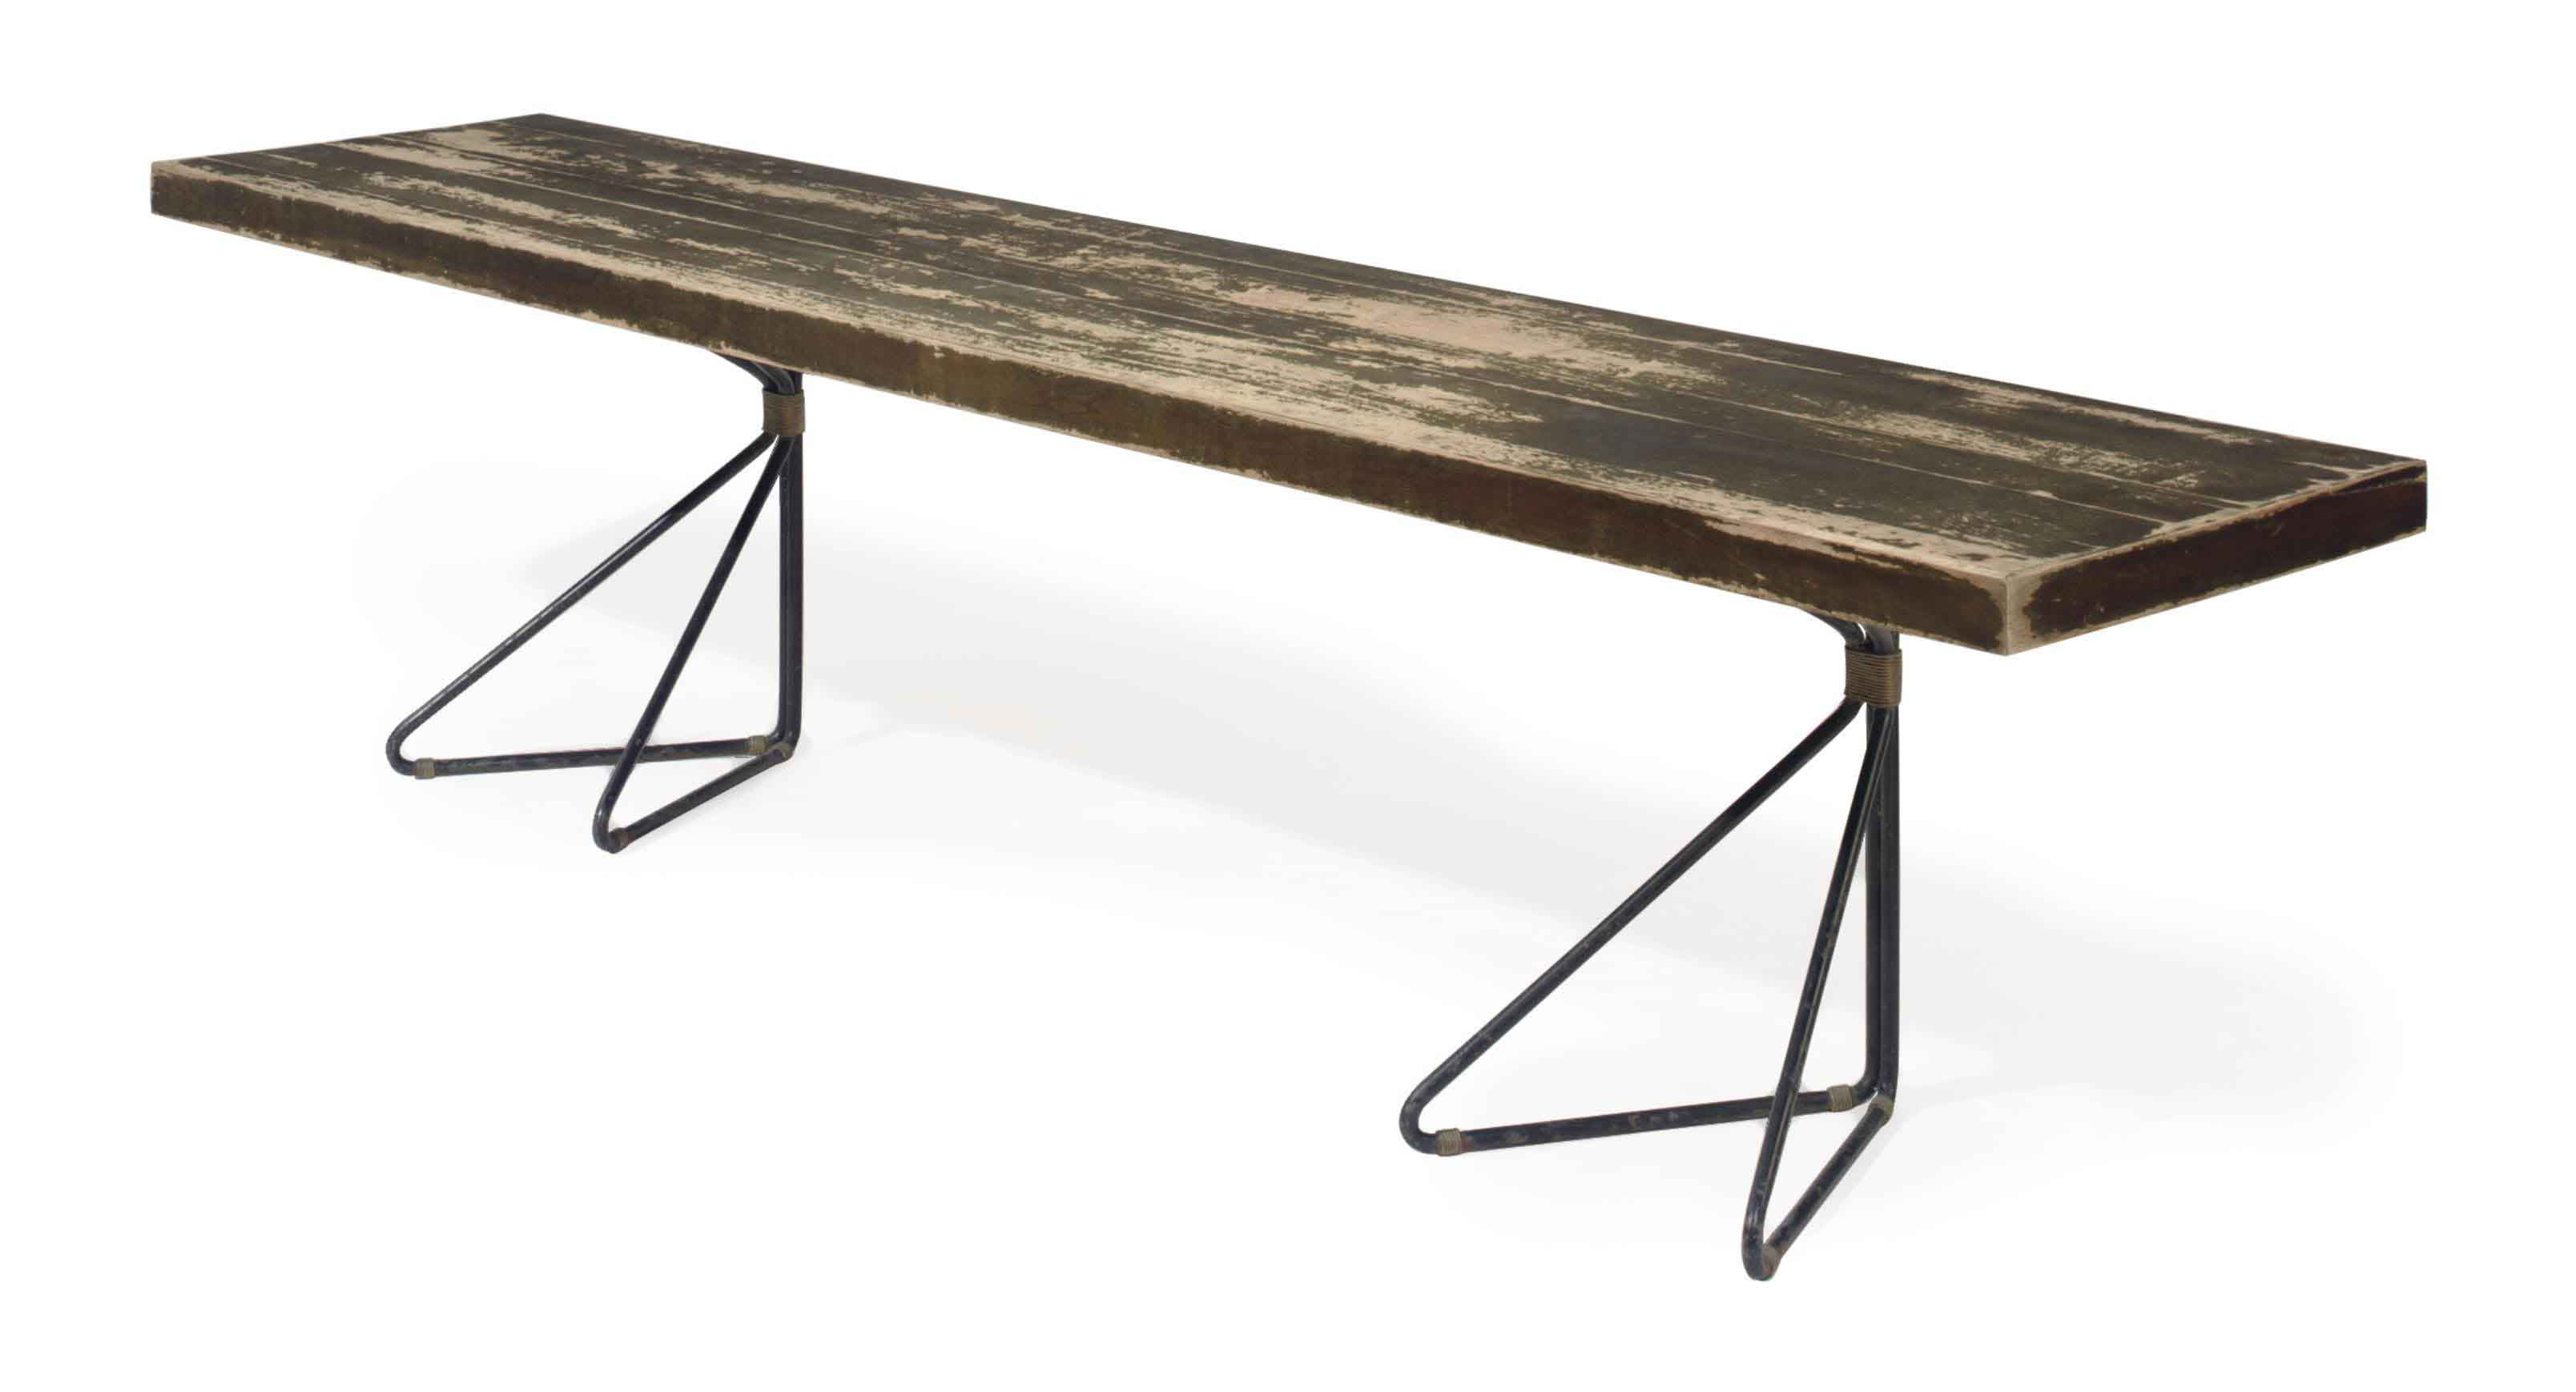 A GILT AND EBONIZED TUBULAR-METAL MAHOGANY CONSOLE TABLE,